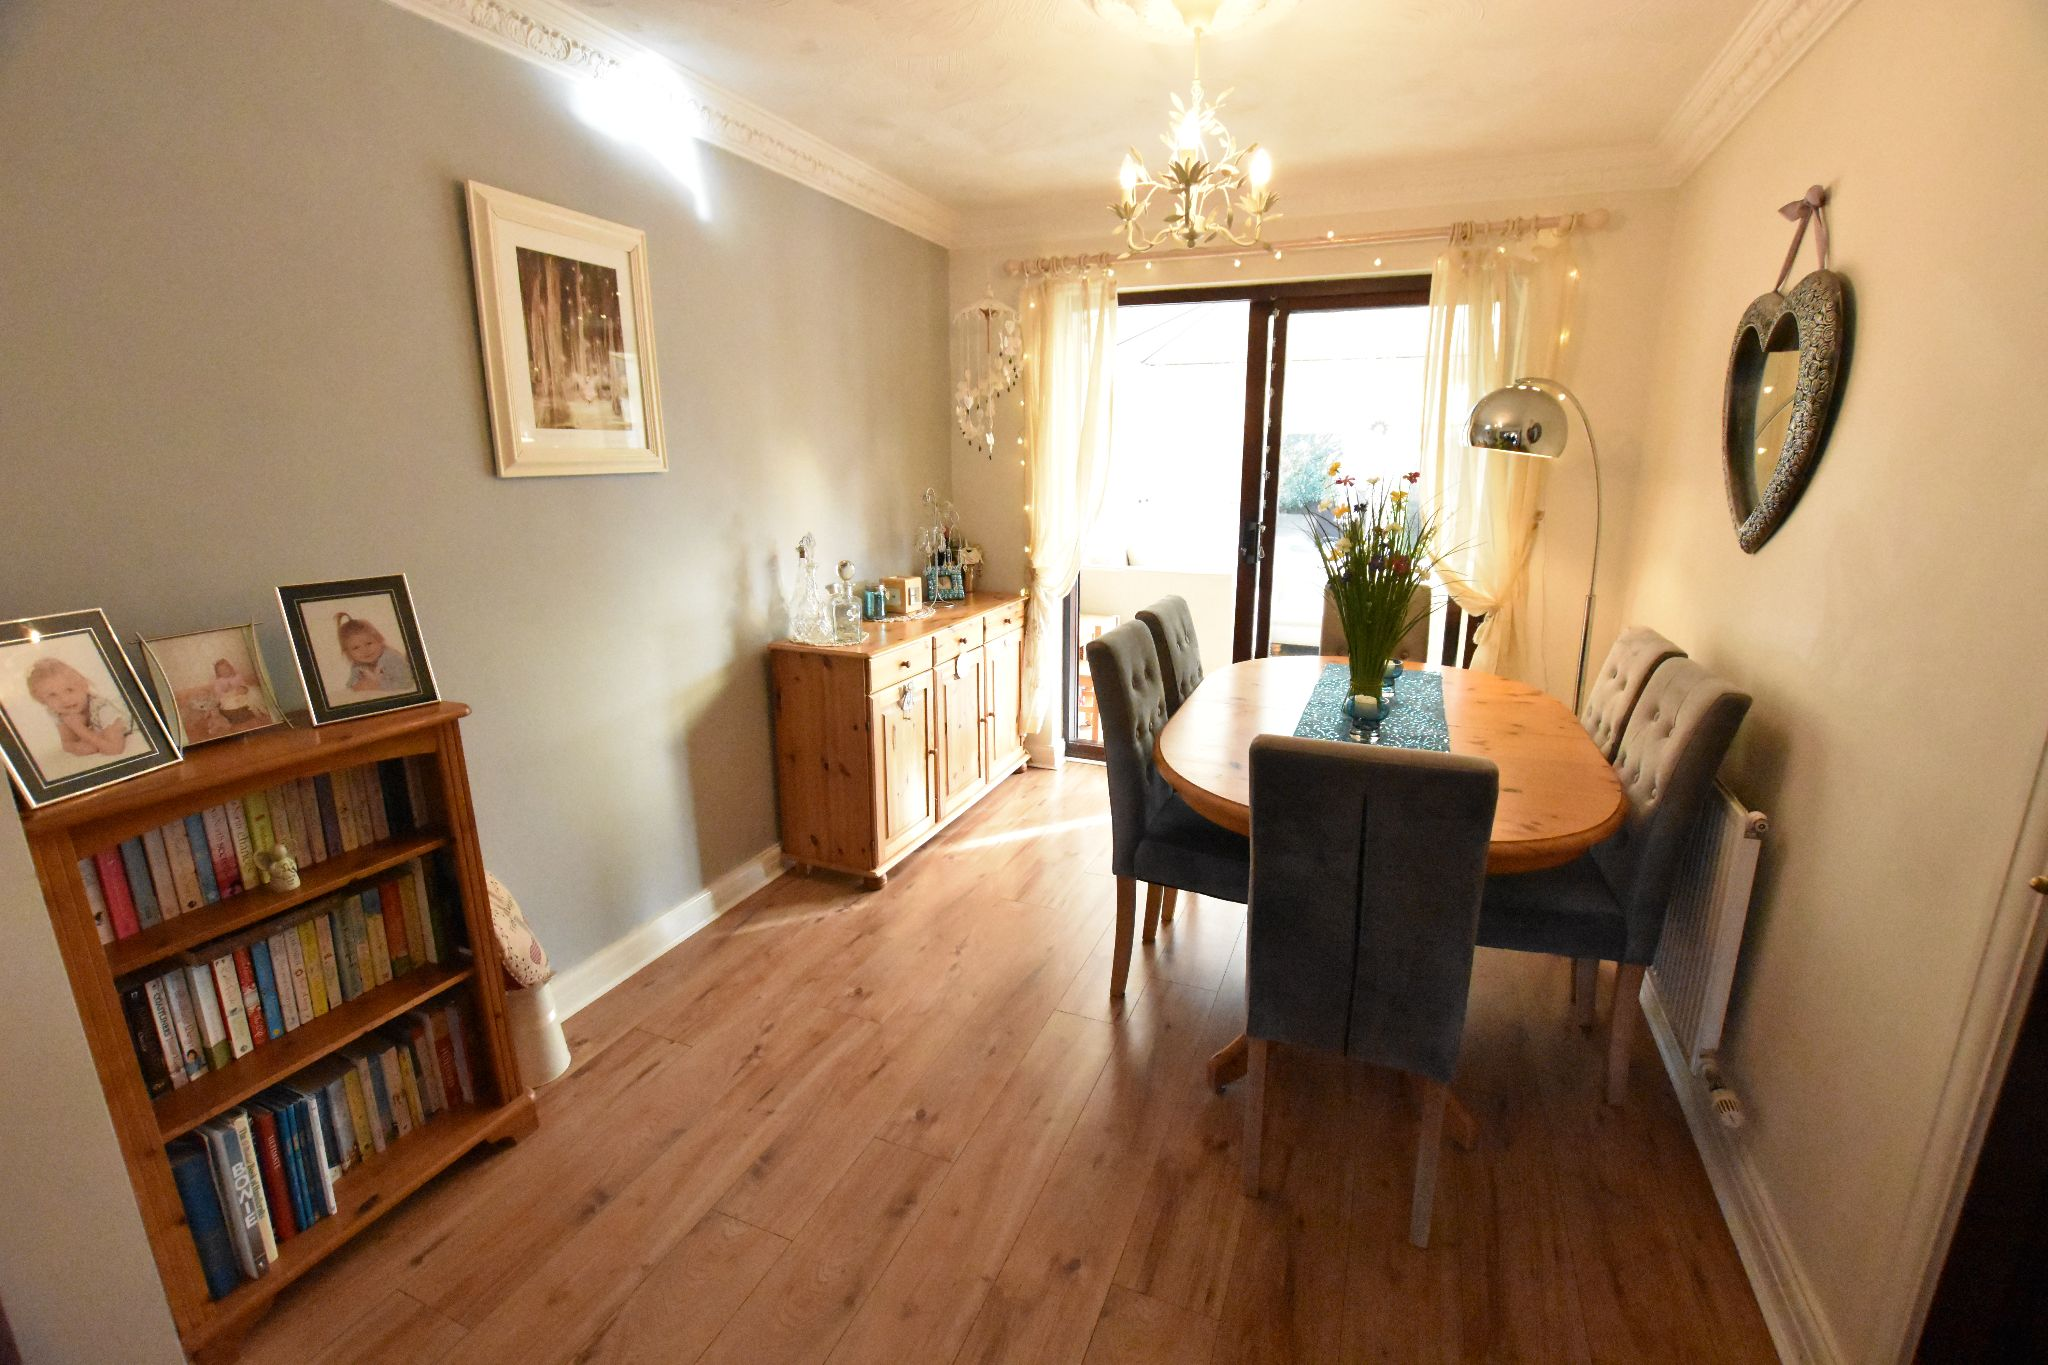 4 bedroom detached house Sold STC in Lytham St. Annes - Diner